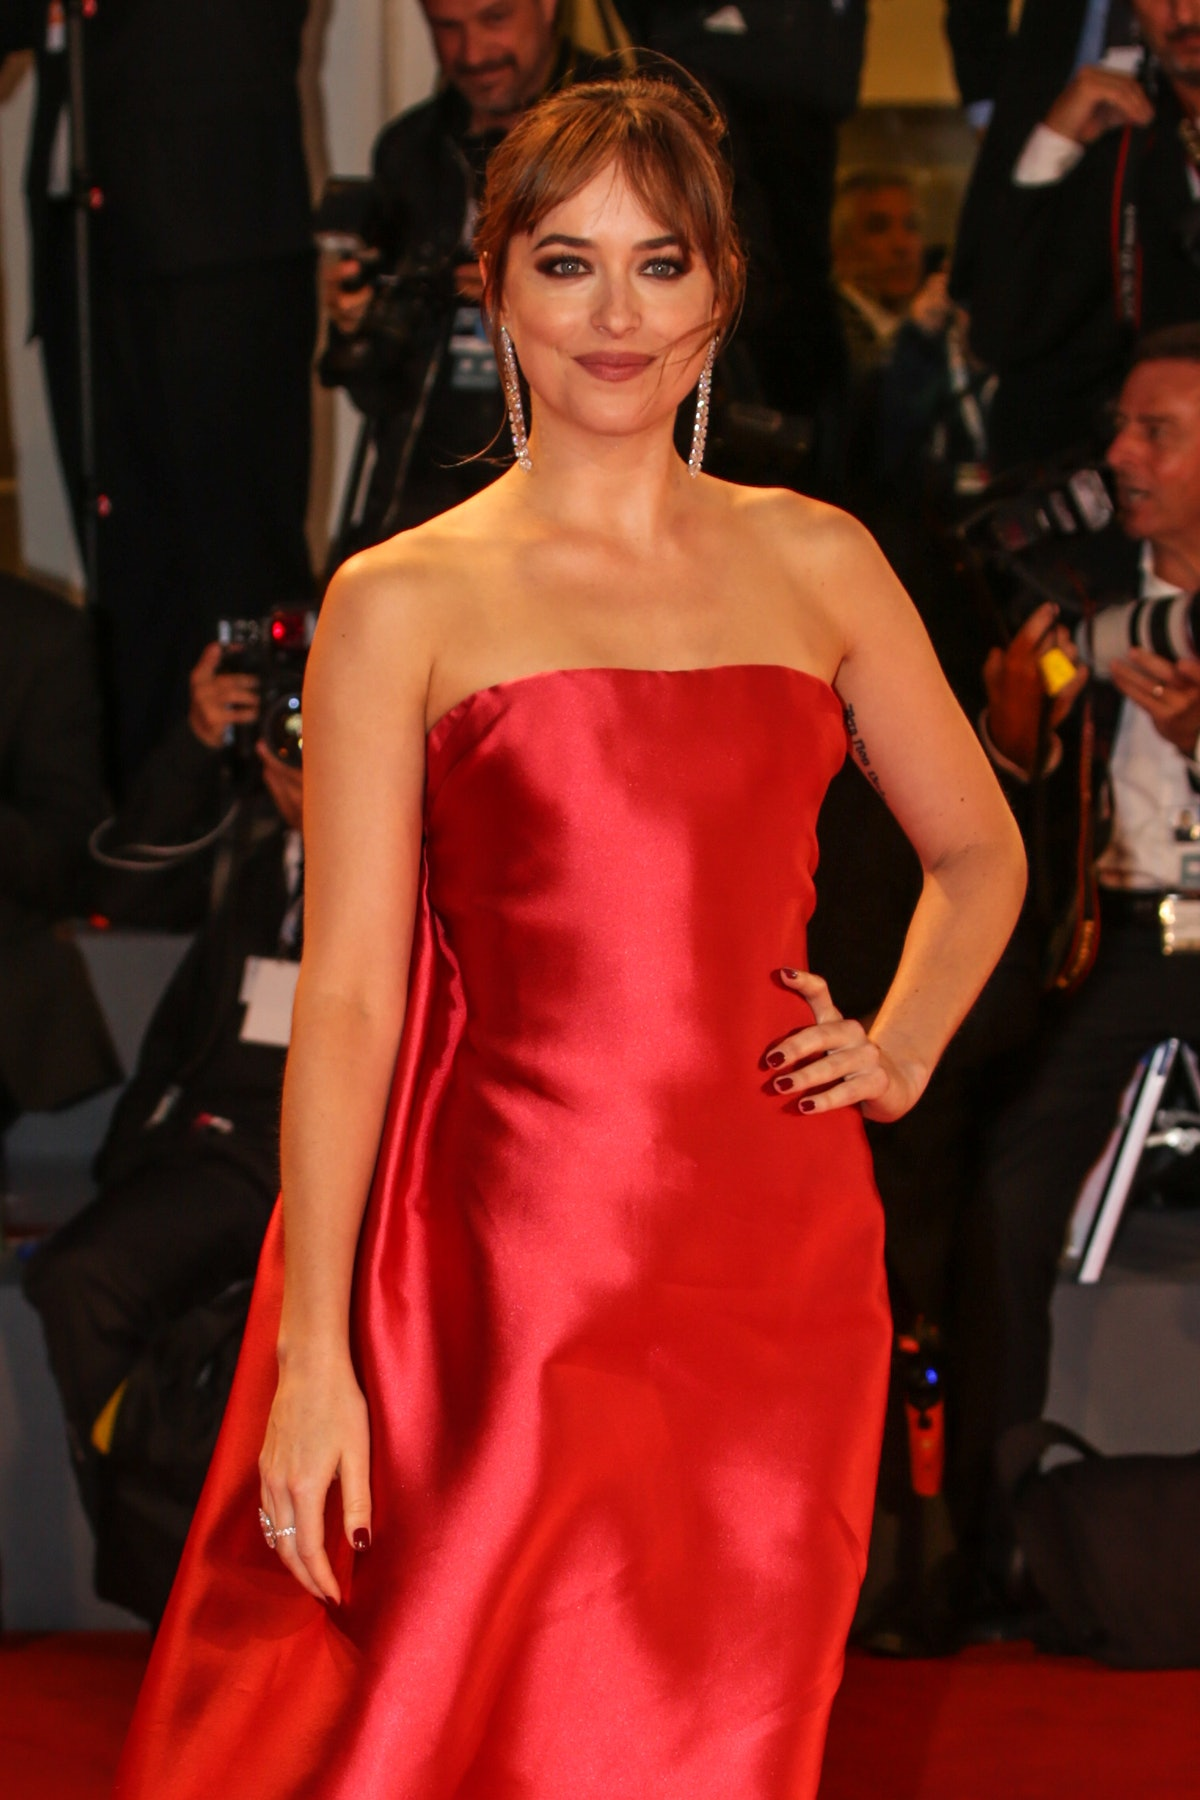 Dakota Johnson's curtain bangs are a thicker style.